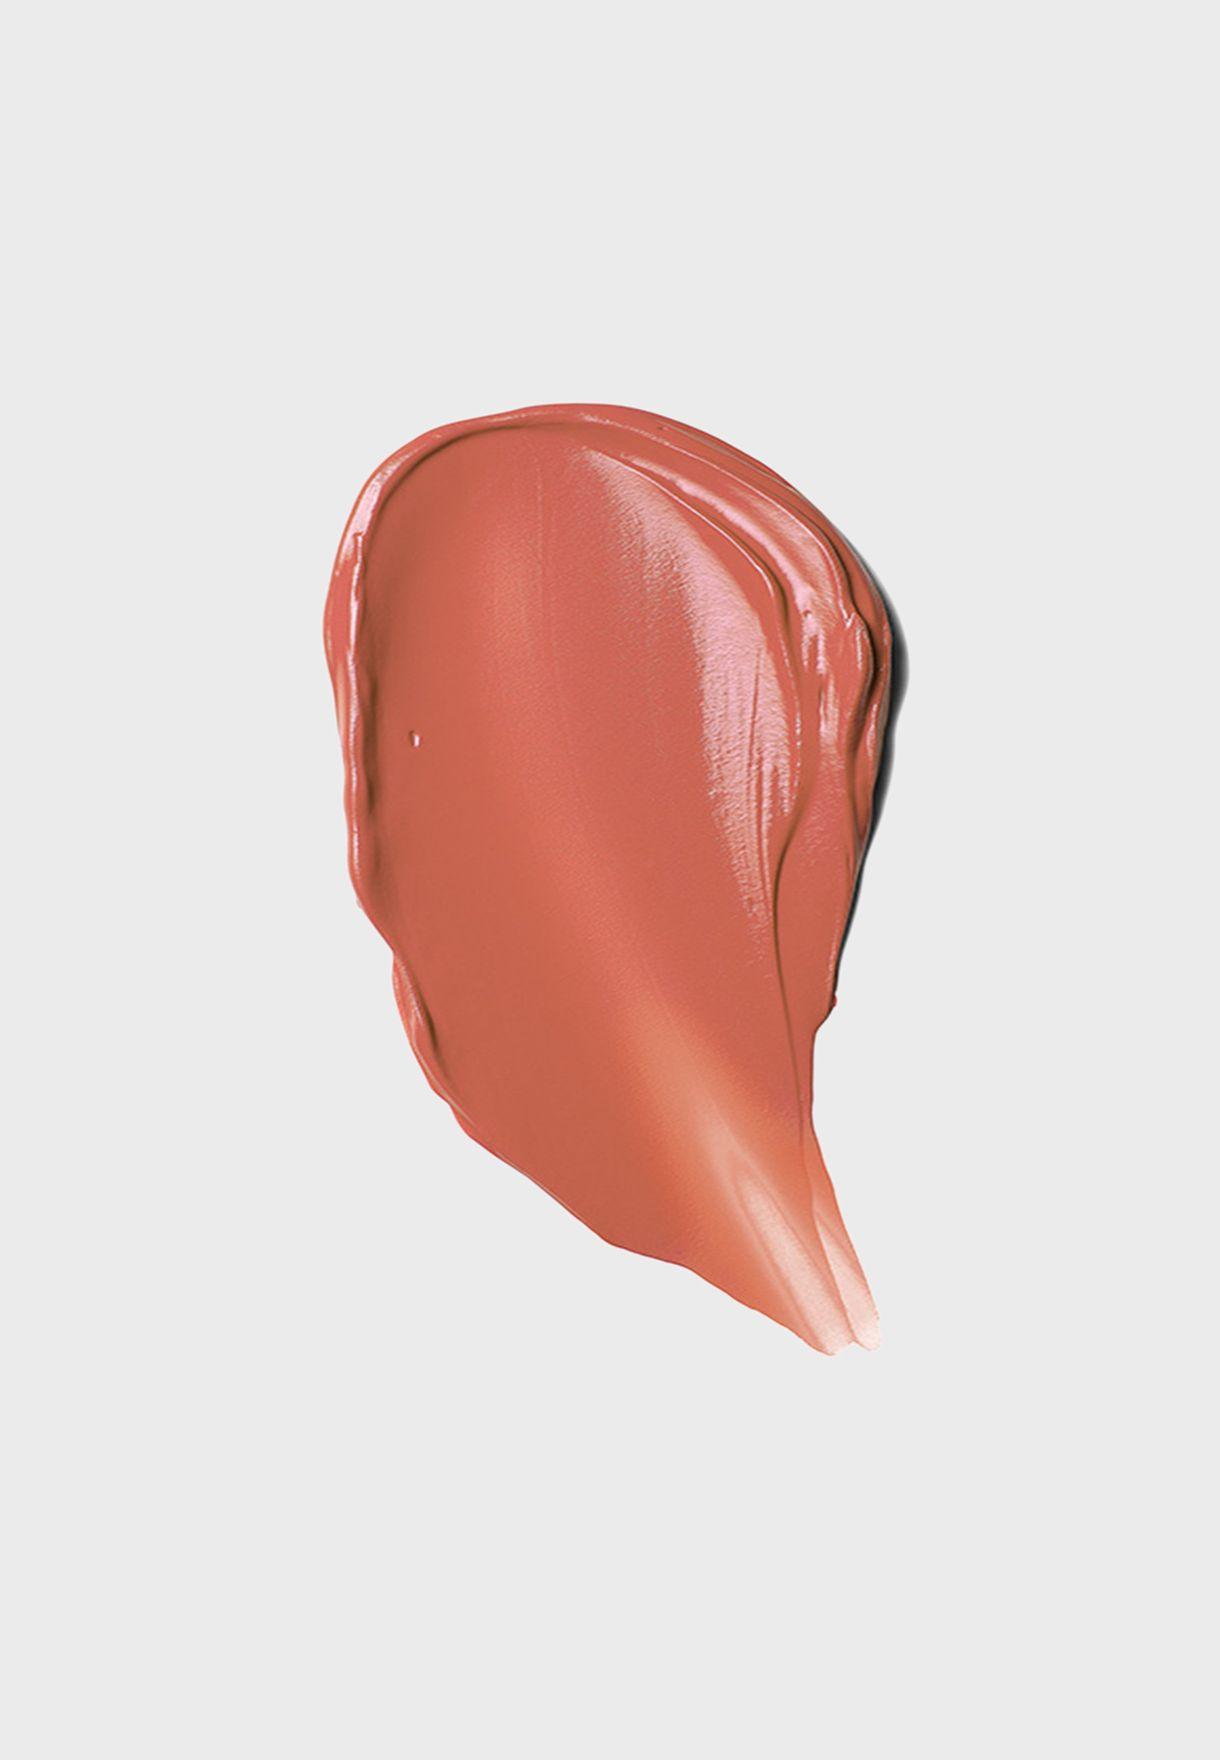 Paint-on Liquid Lip Color- Fierce Beauty